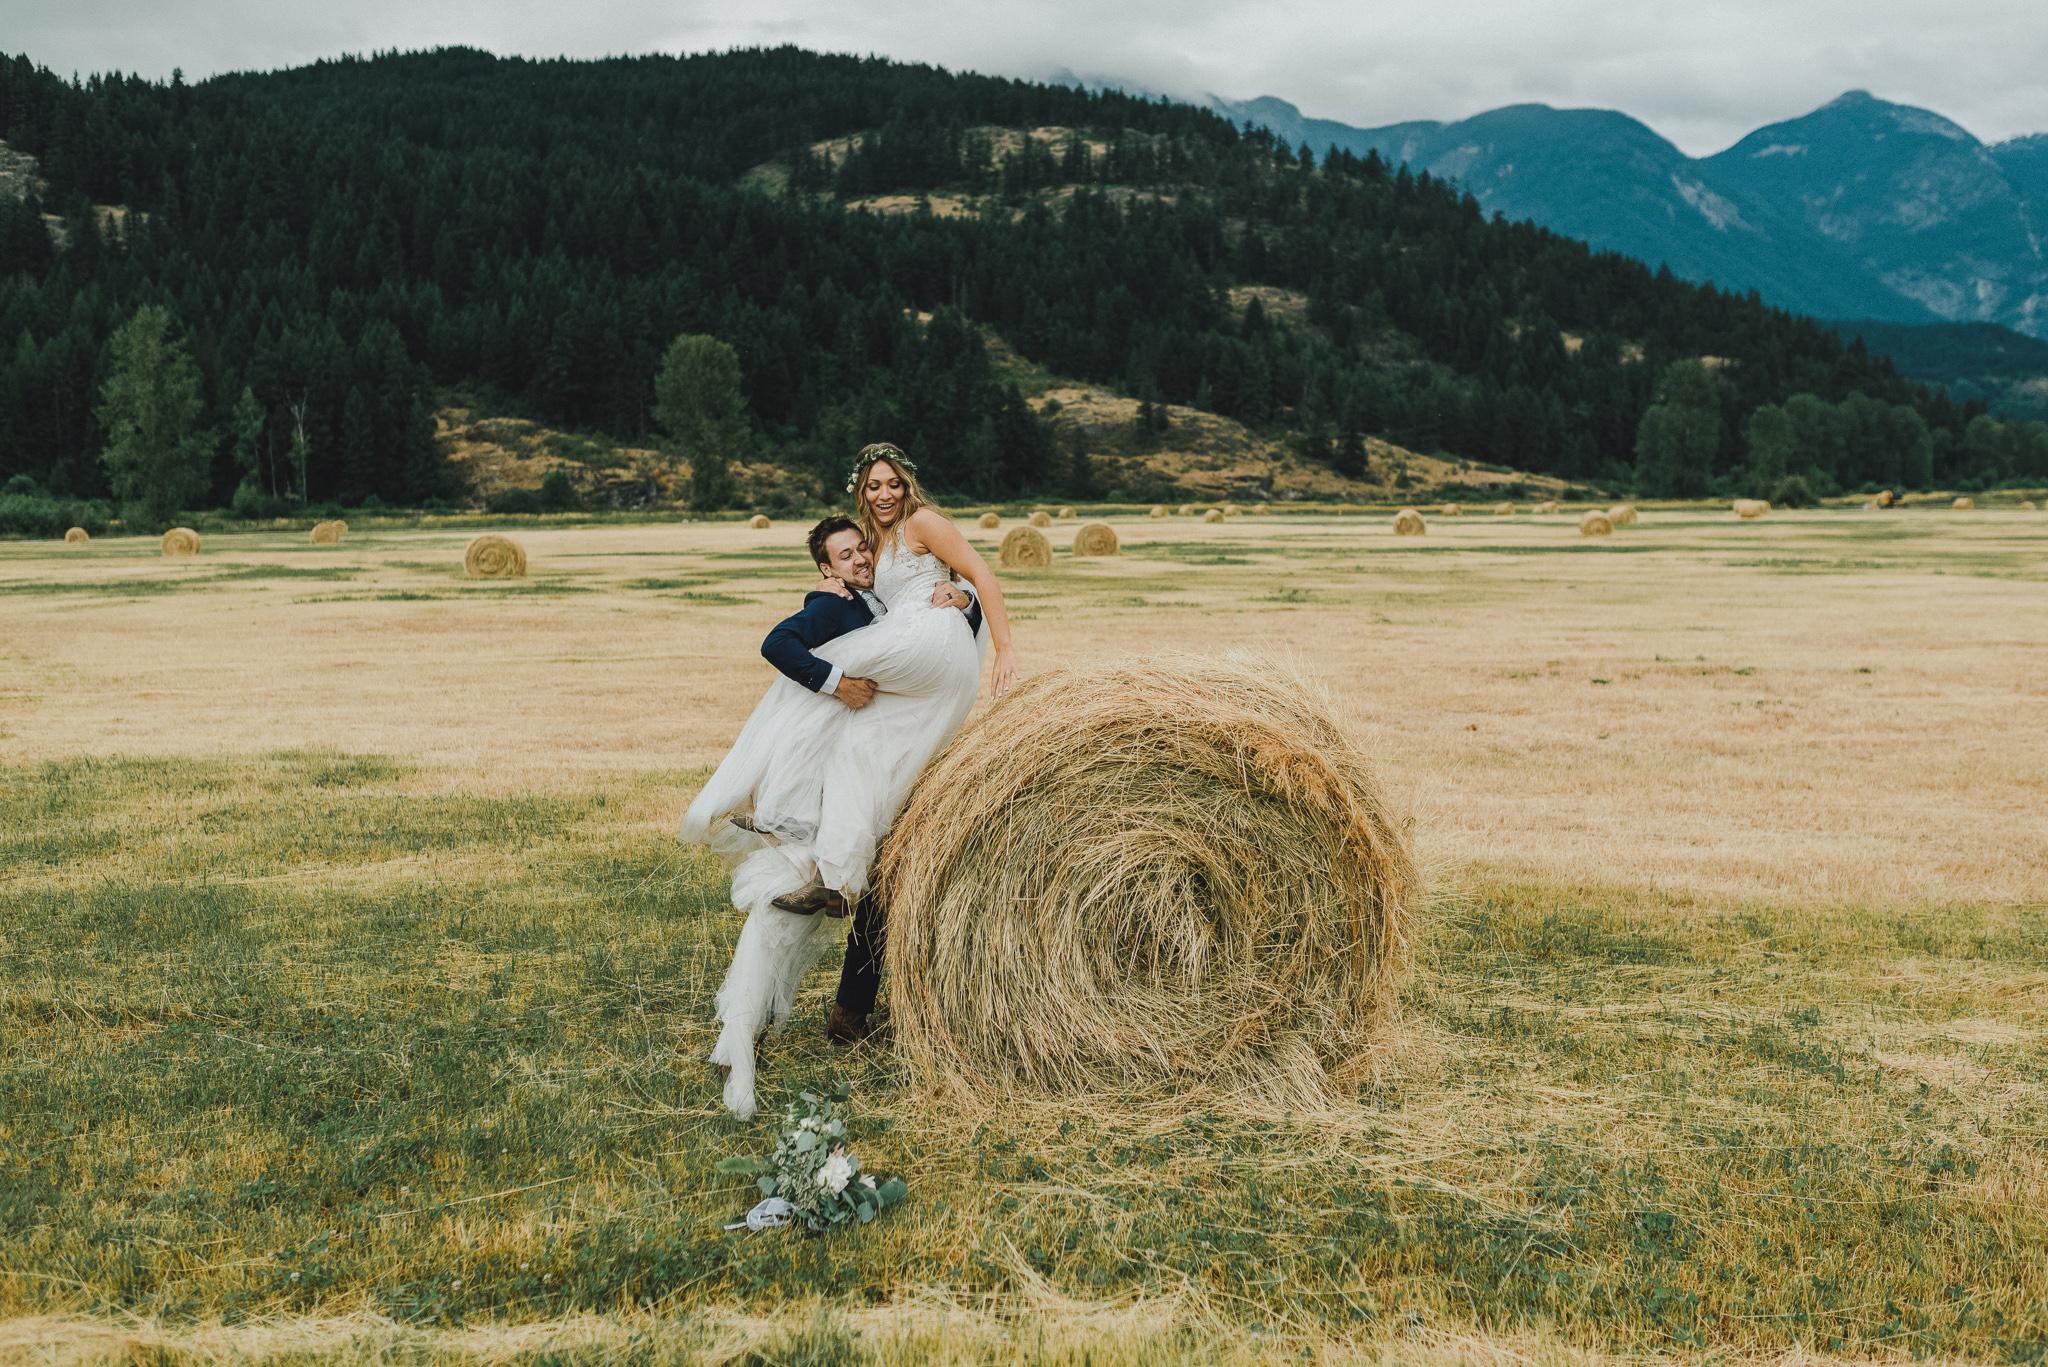 pemberton-riverlands-equestrian-red-barn-wedding (54 of 79).jpg